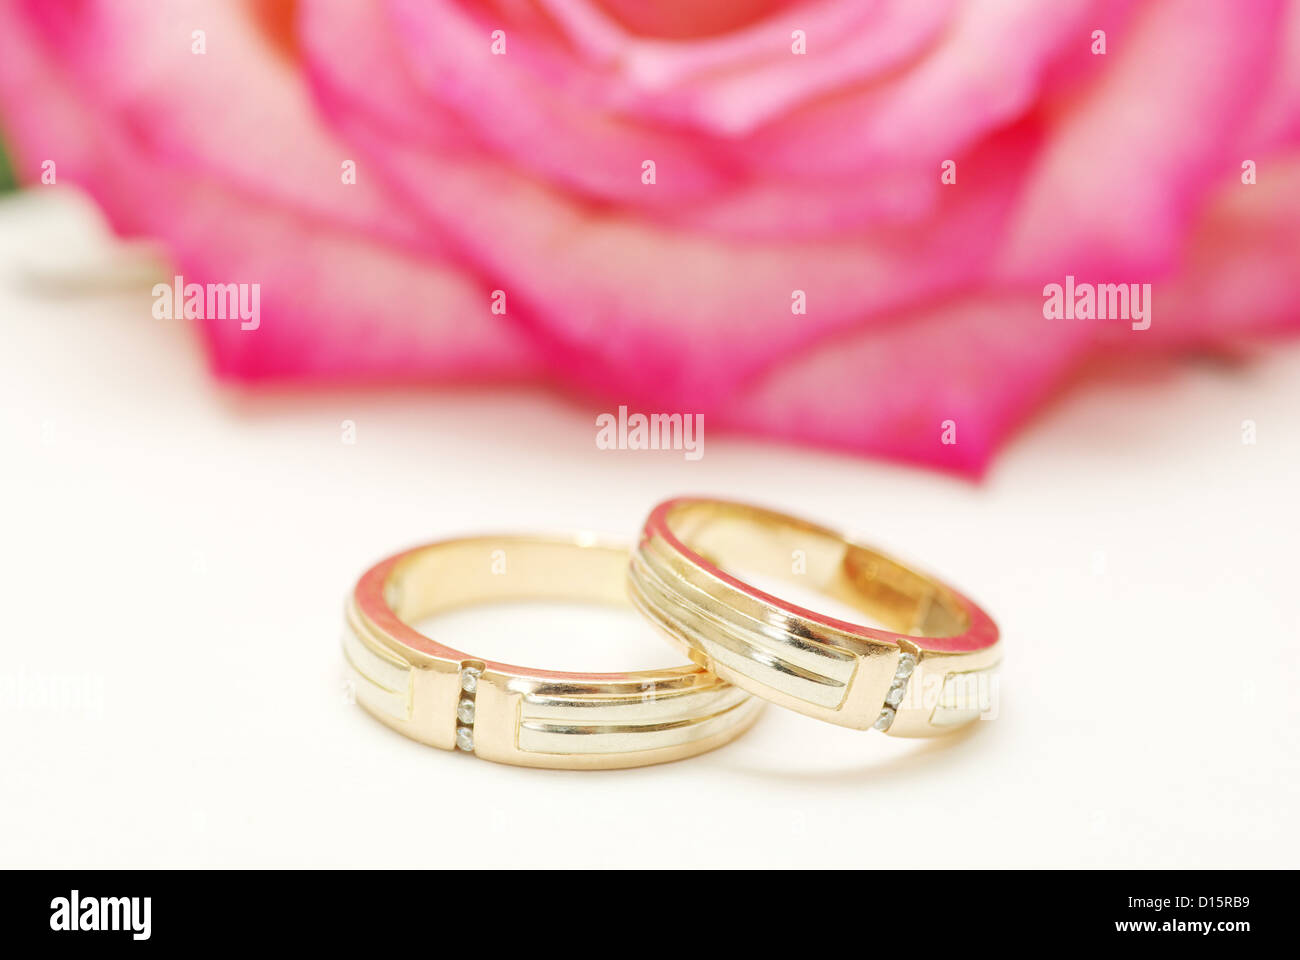 Wedding Rings Rose Petals Stock Photos & Wedding Rings Rose Petals ...